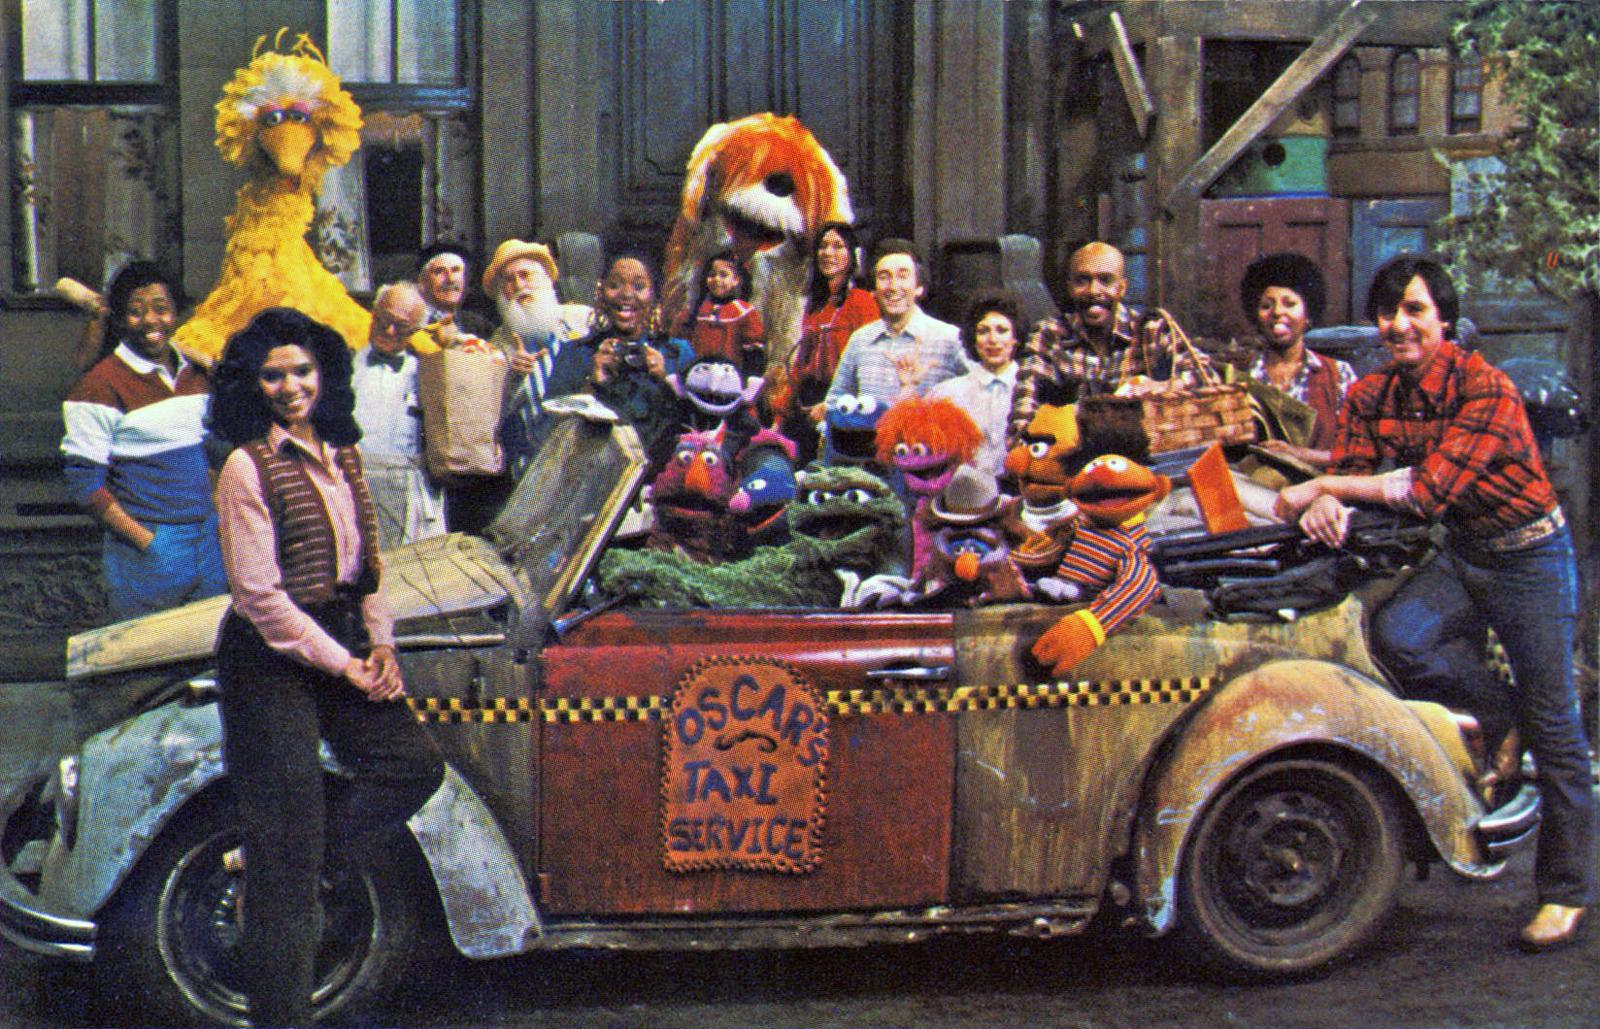 Sesame Street Music Archive: Sesame Street Music Albums 1 & 2